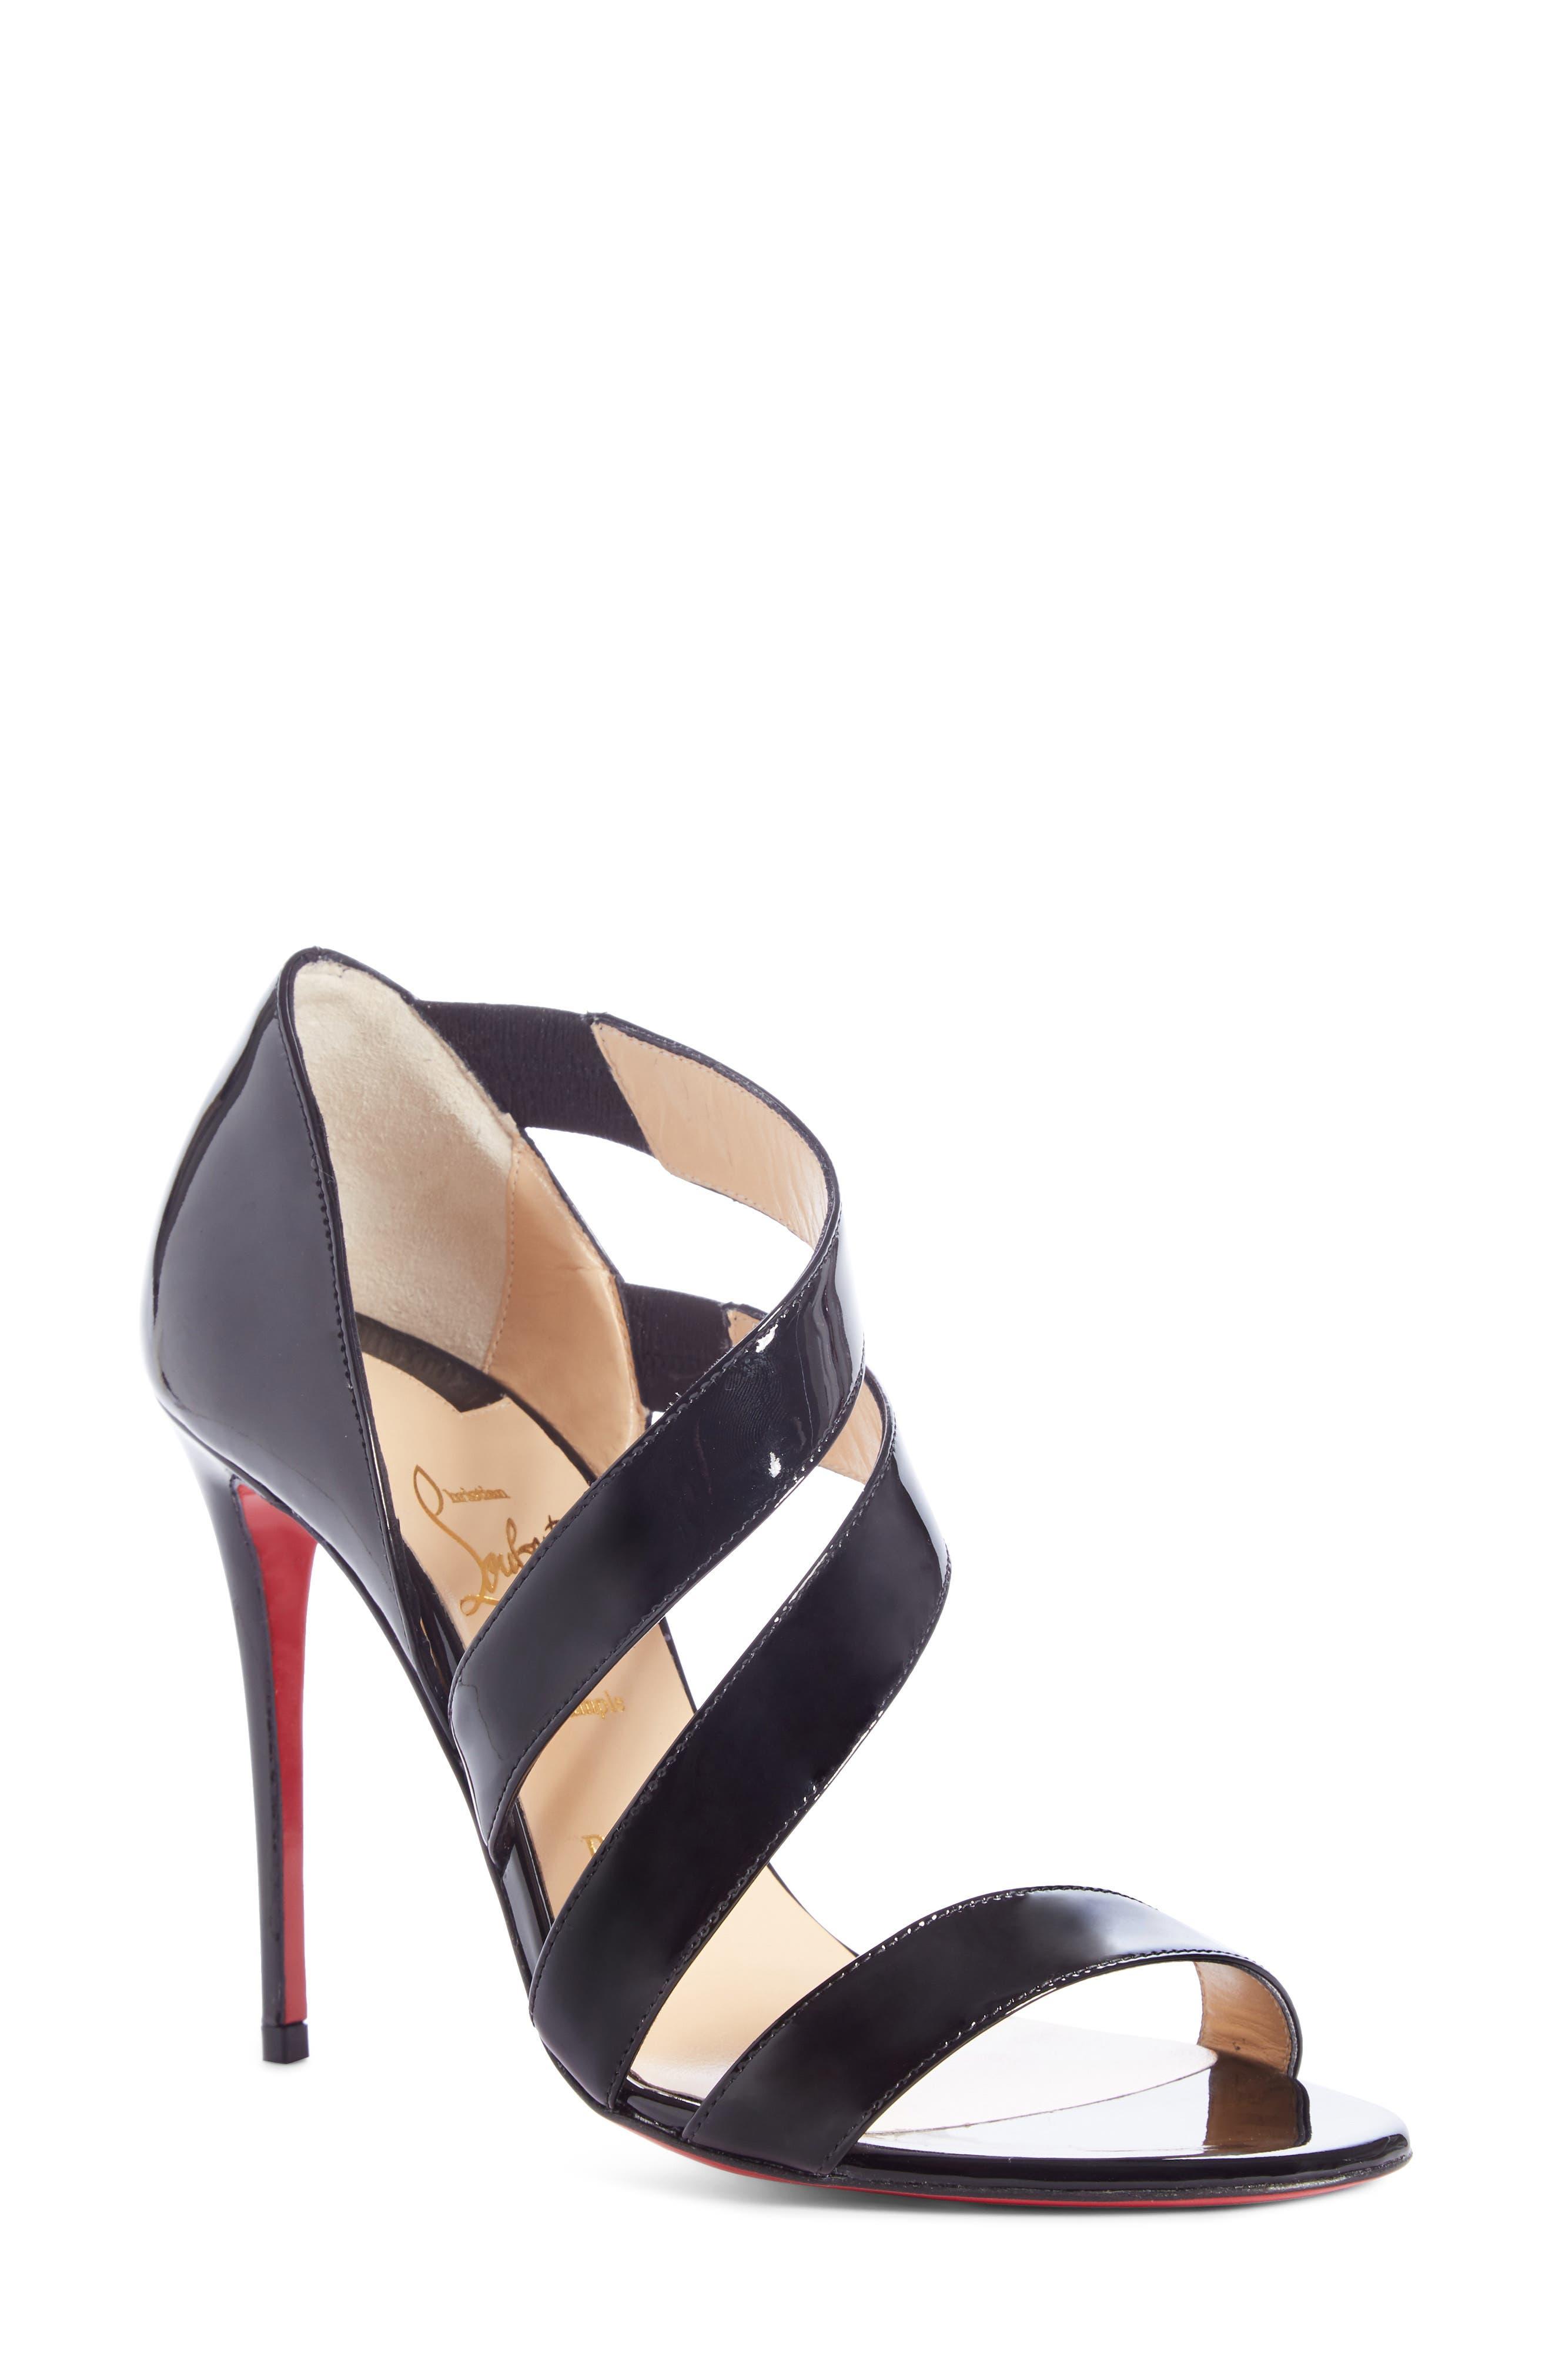 CHRISTIAN LOUBOUTIN World Copine Asymmetrical Sandal, Main, color, BLACK PATENT